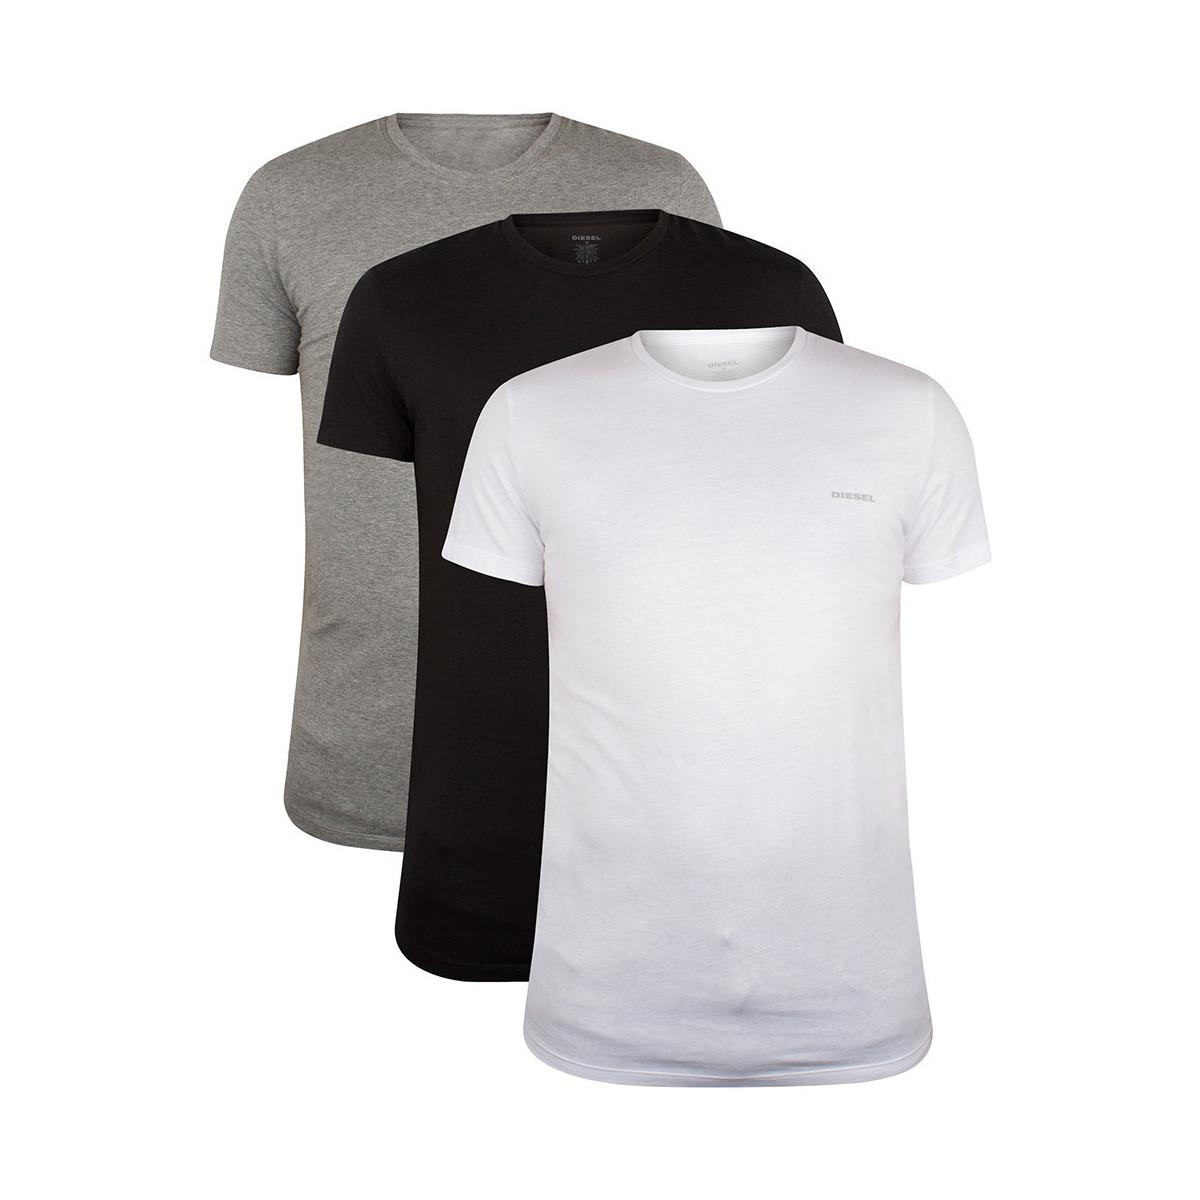 50 100 PACK FRUIT OF THE LOOM MENS PLAIN WHITE BLACK T-SHIRT LOT WHOLESALE BULK